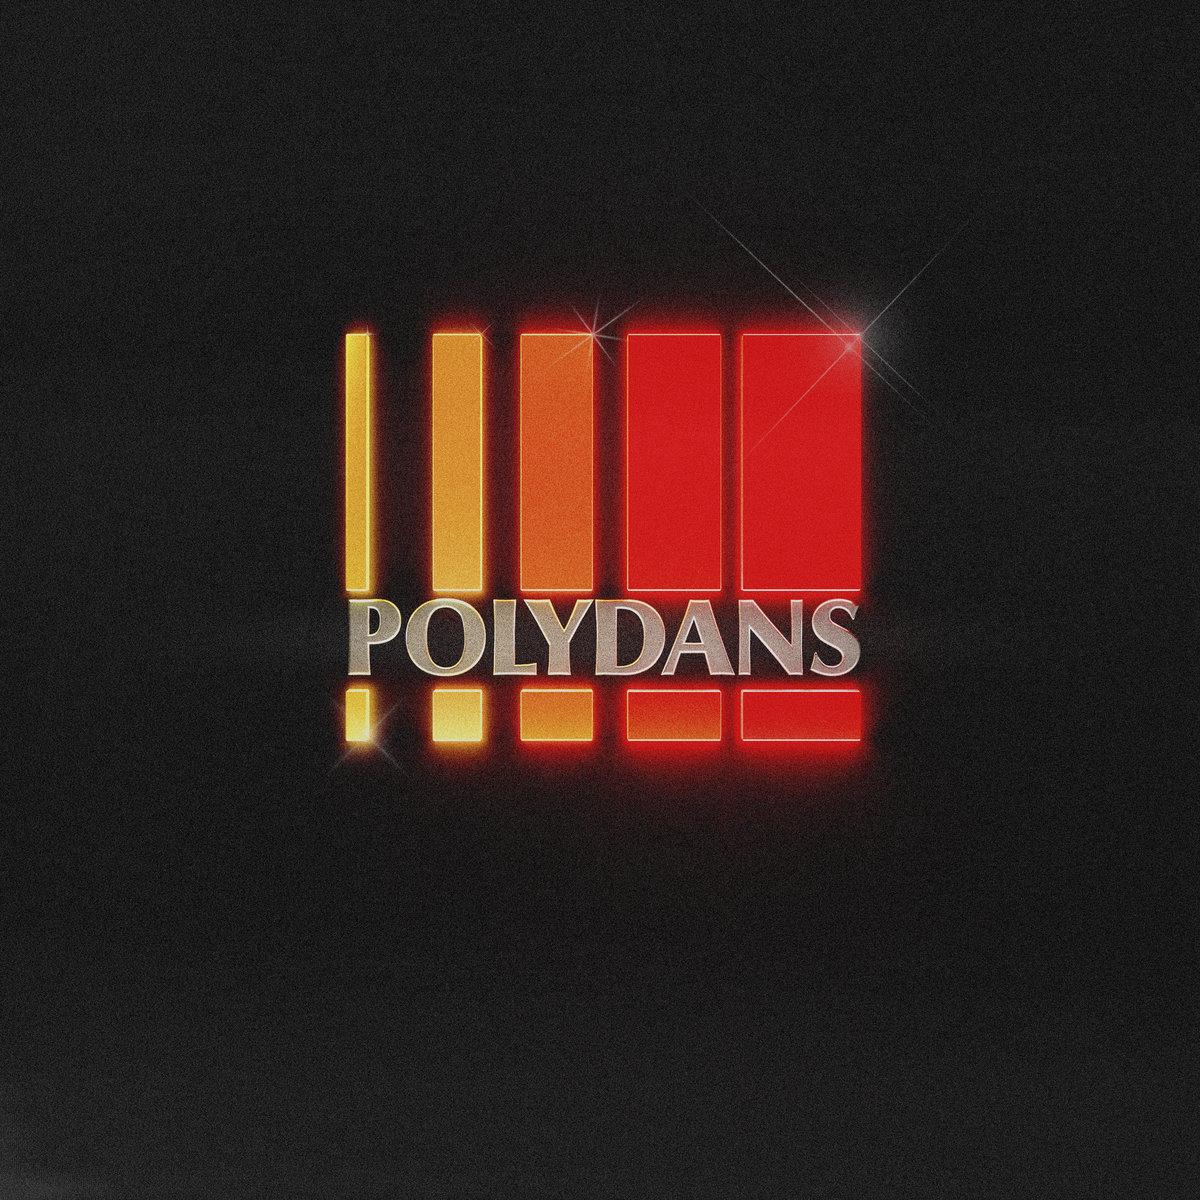 News – Roosevelt – Polydans